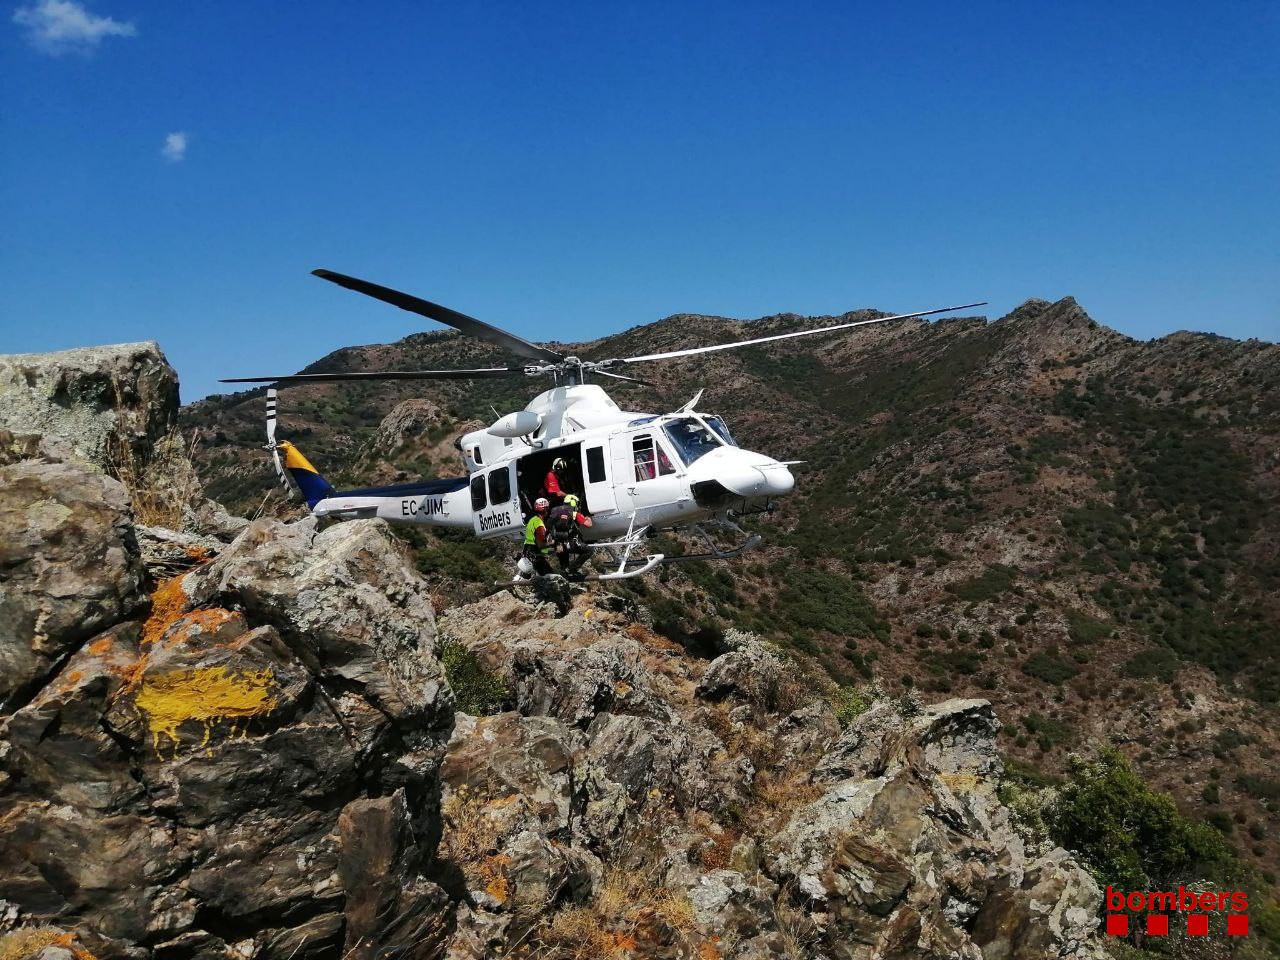 Bombers Catalunya rescate montaña